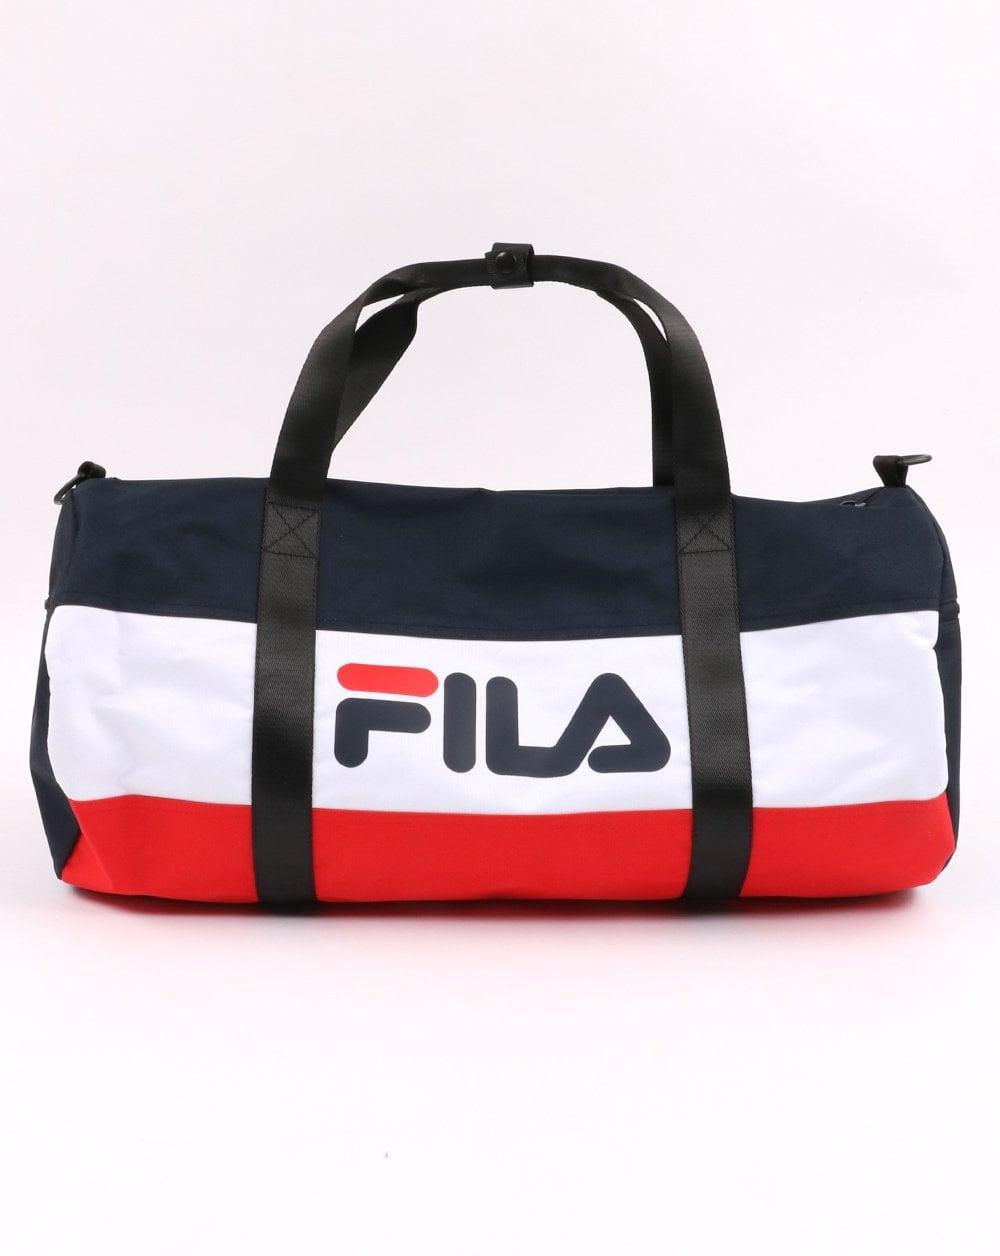 febffeb0c44d72 Fila Vintage Holdall Bag Navy/White/Red | 80s Casual Classics